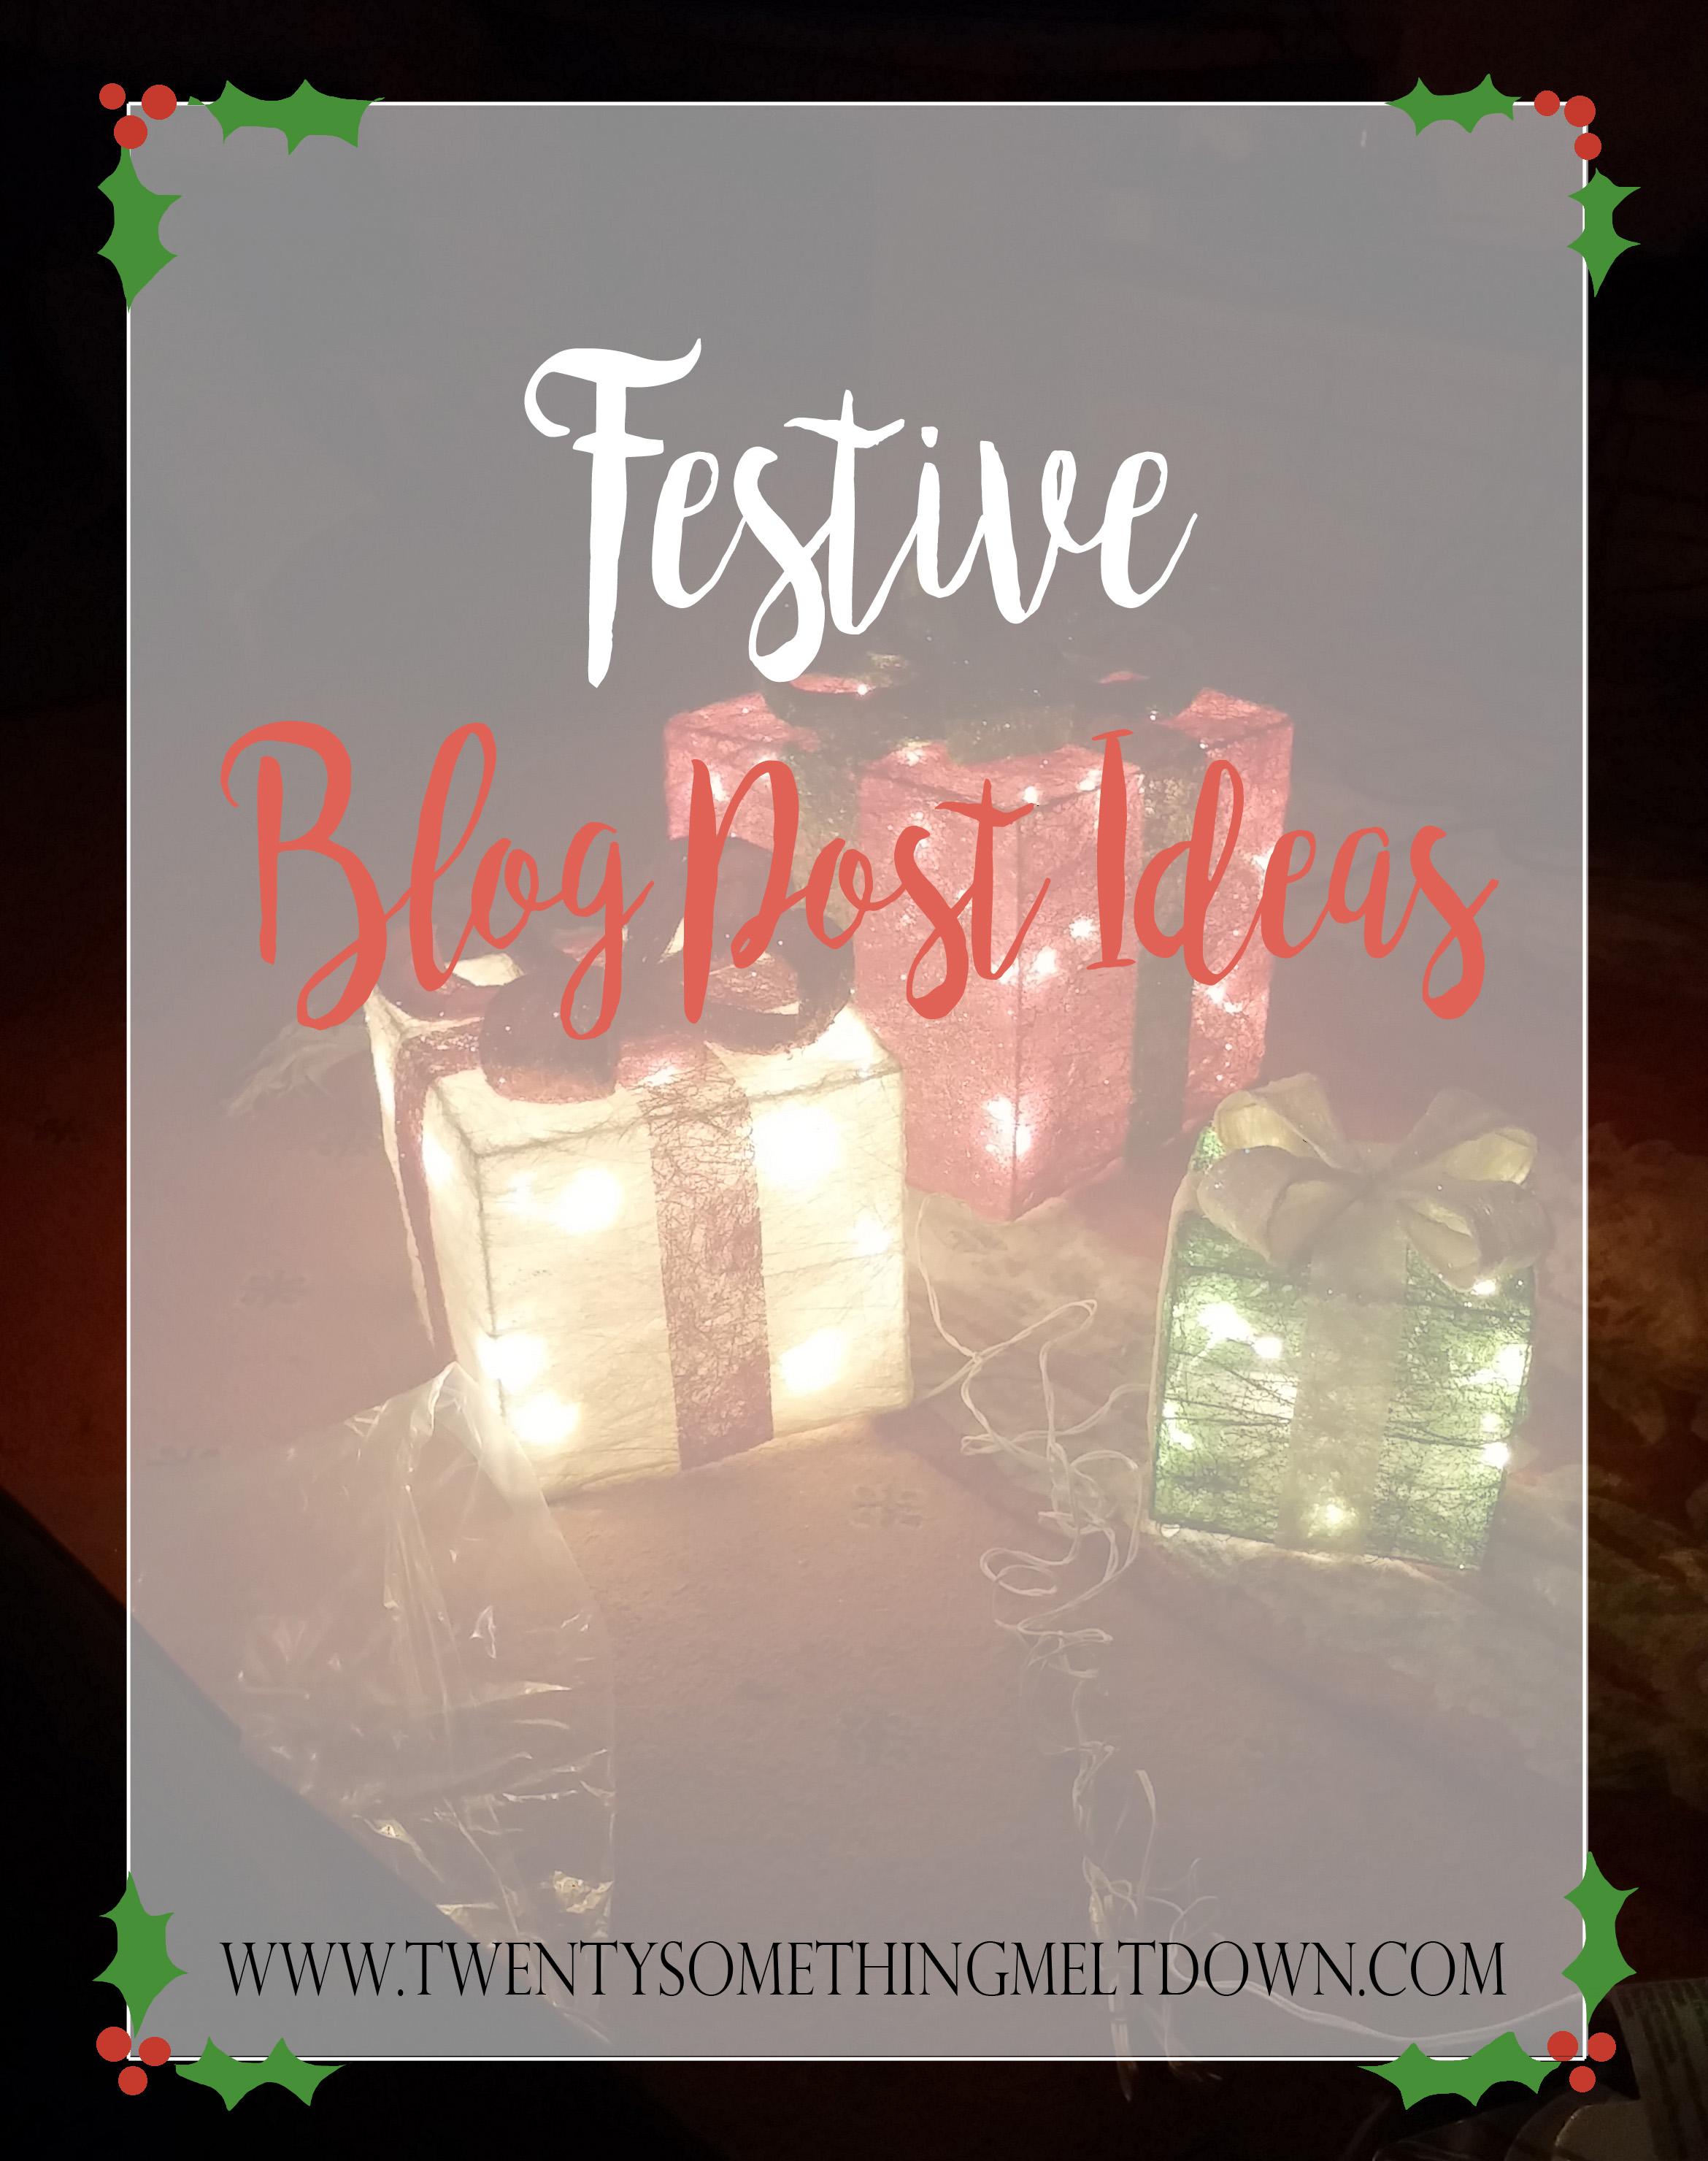 festiveblog.jpg